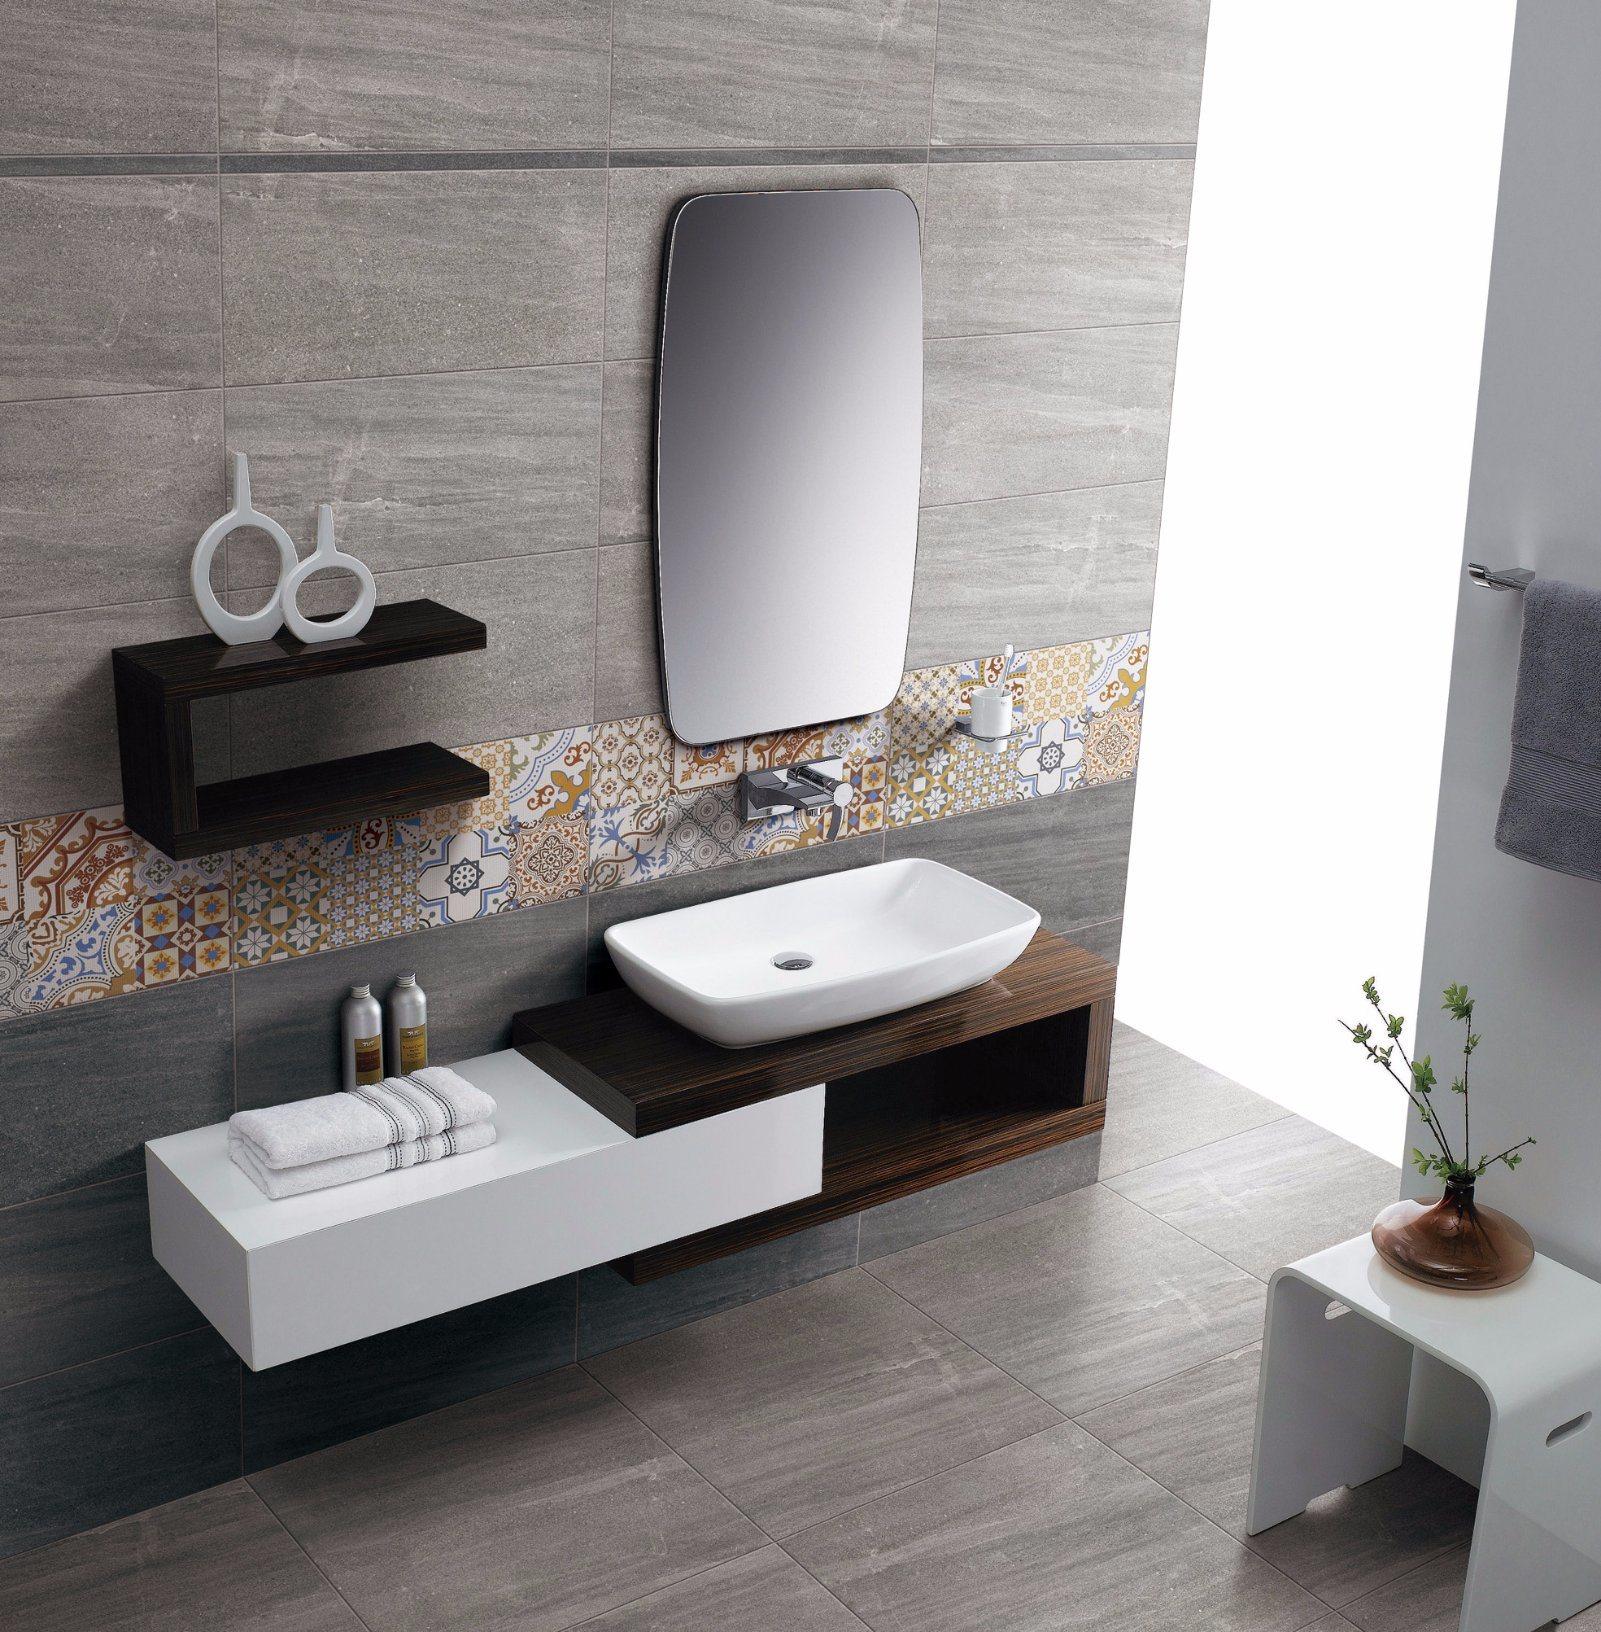 Sand Stone Cement Look Porcelain Floor Tile Lx6616W